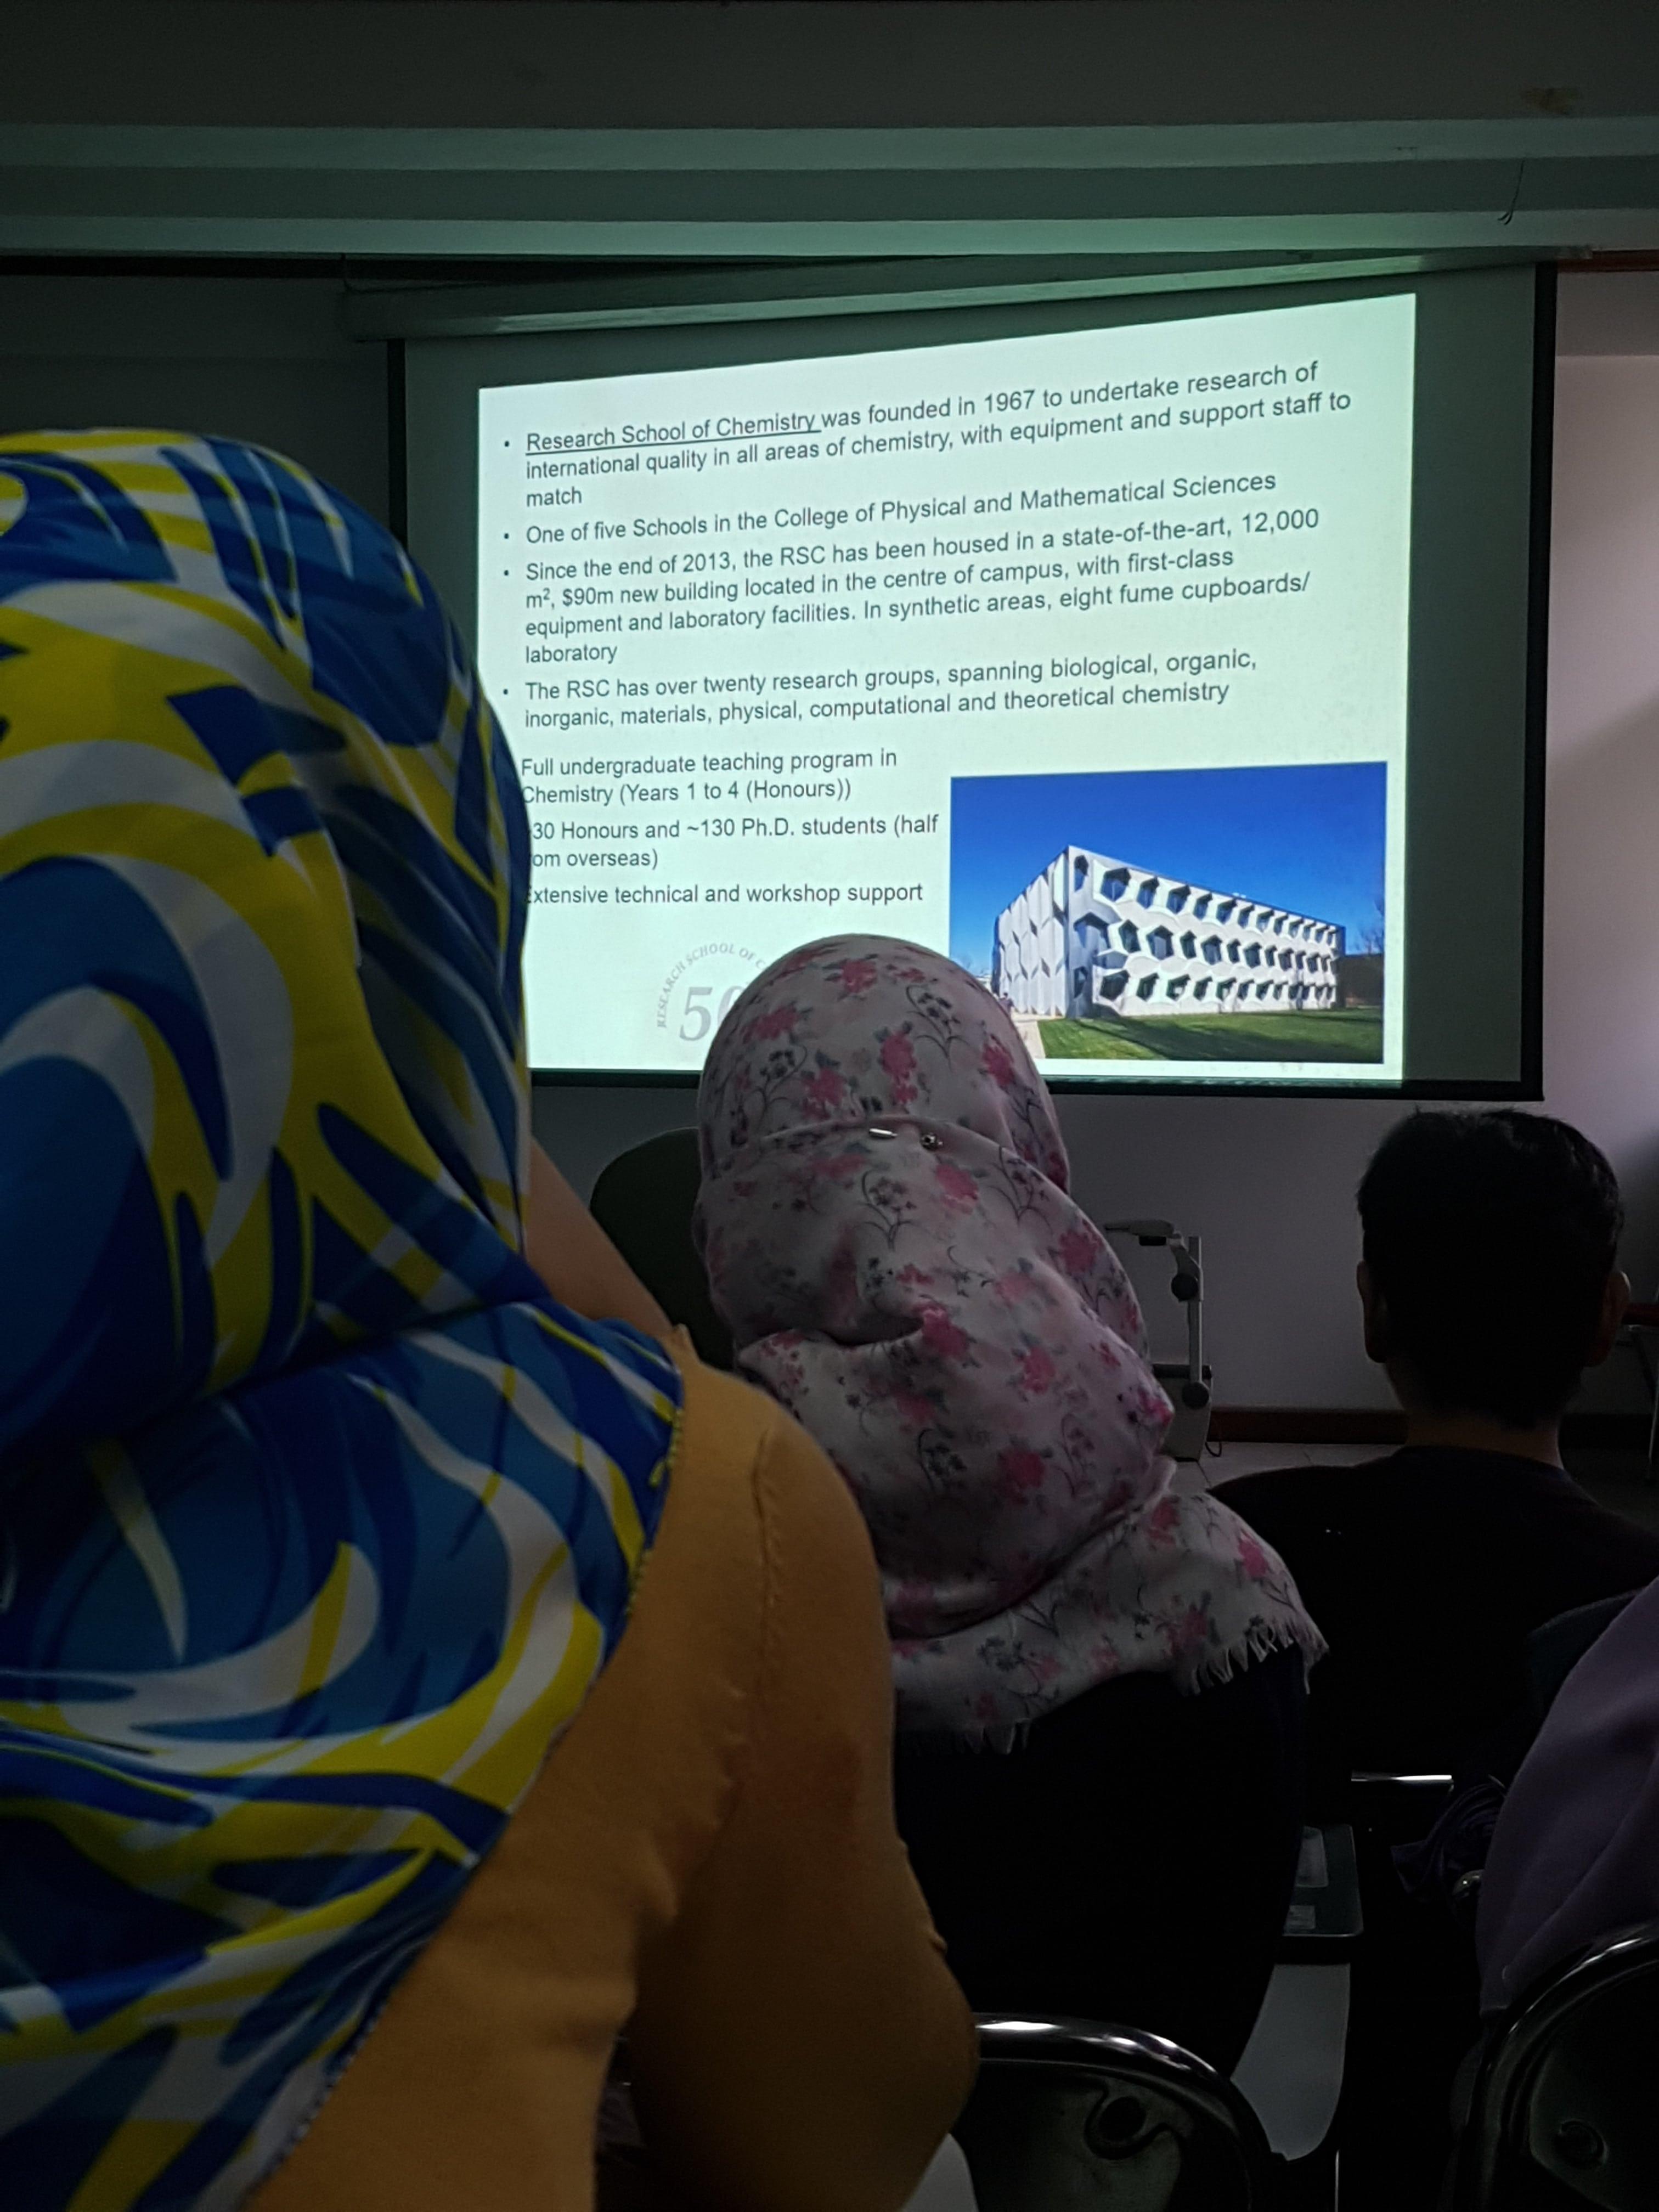 fmipa-itb-gelar-guest-lecture-dalam-peringatan-dies-natalis-70-tahun-pendidikan-kimia